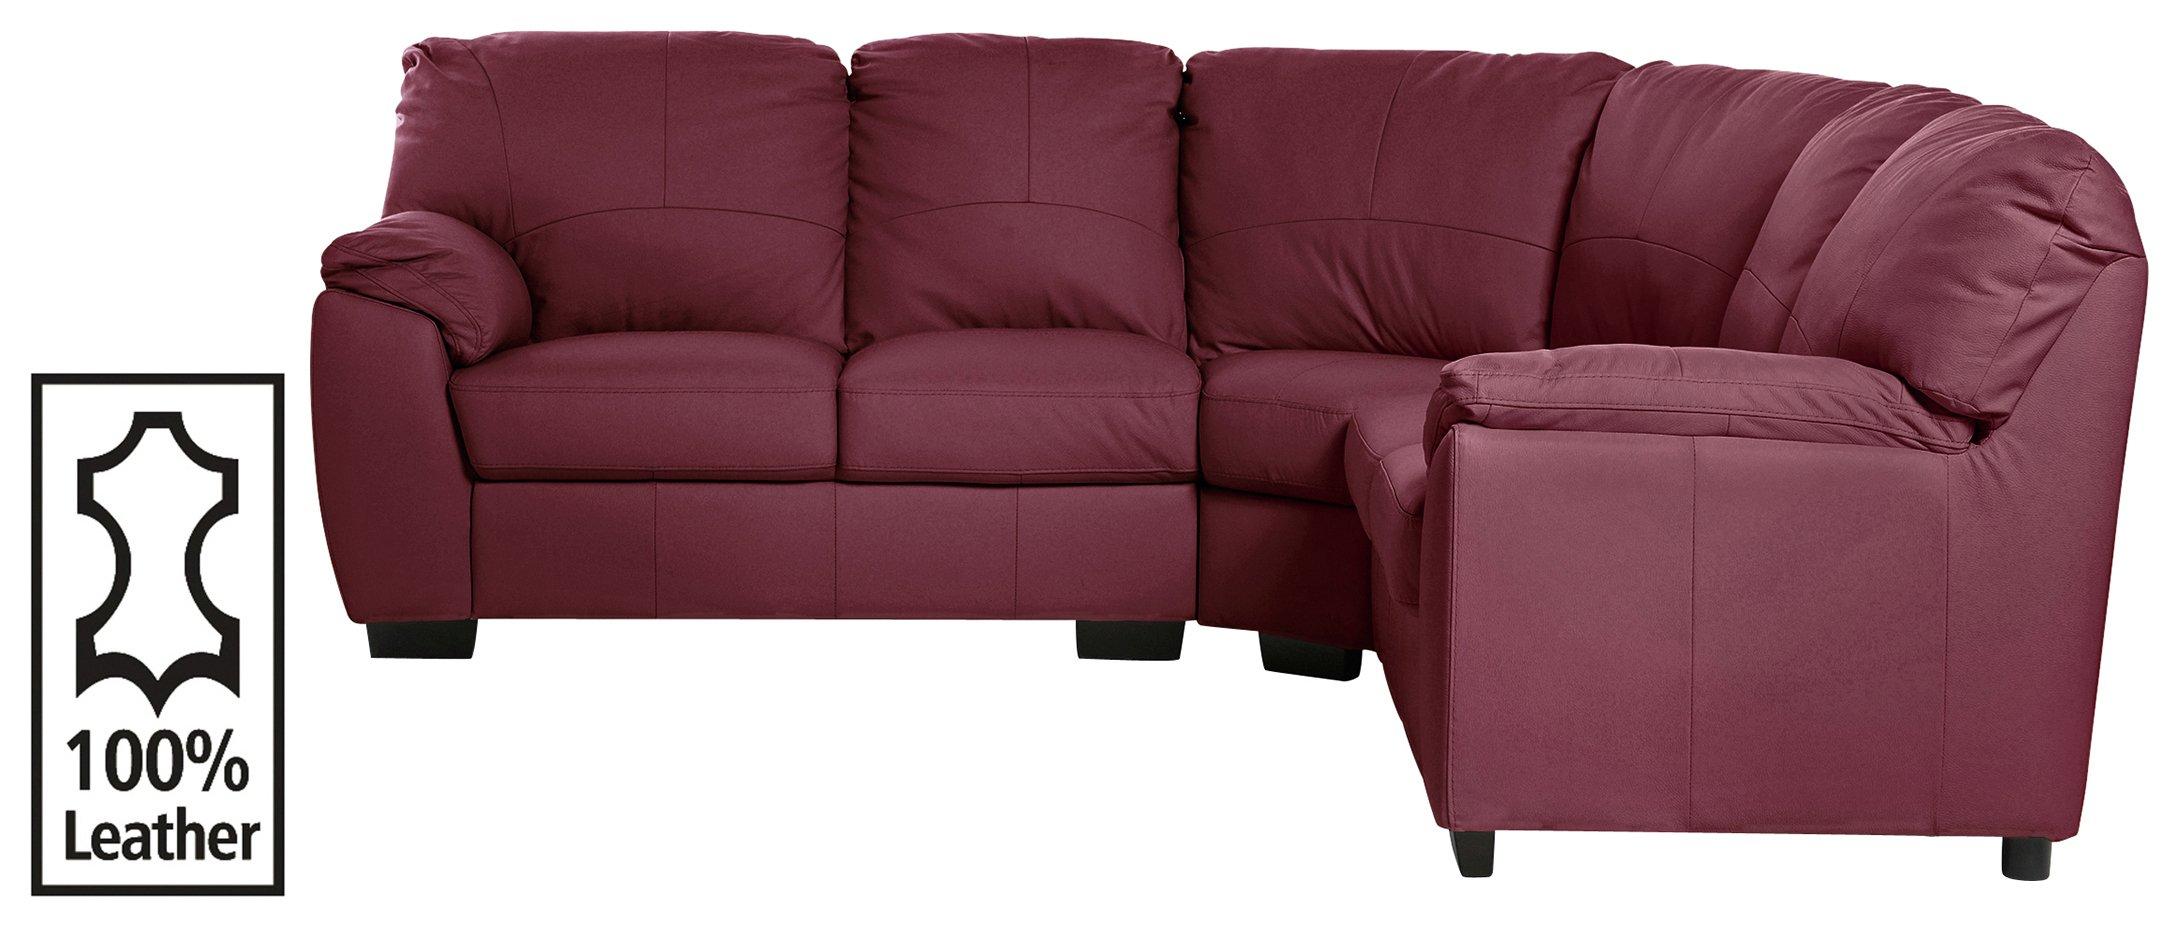 Argos Home Milano Corner Leather Sofa - Burgundy